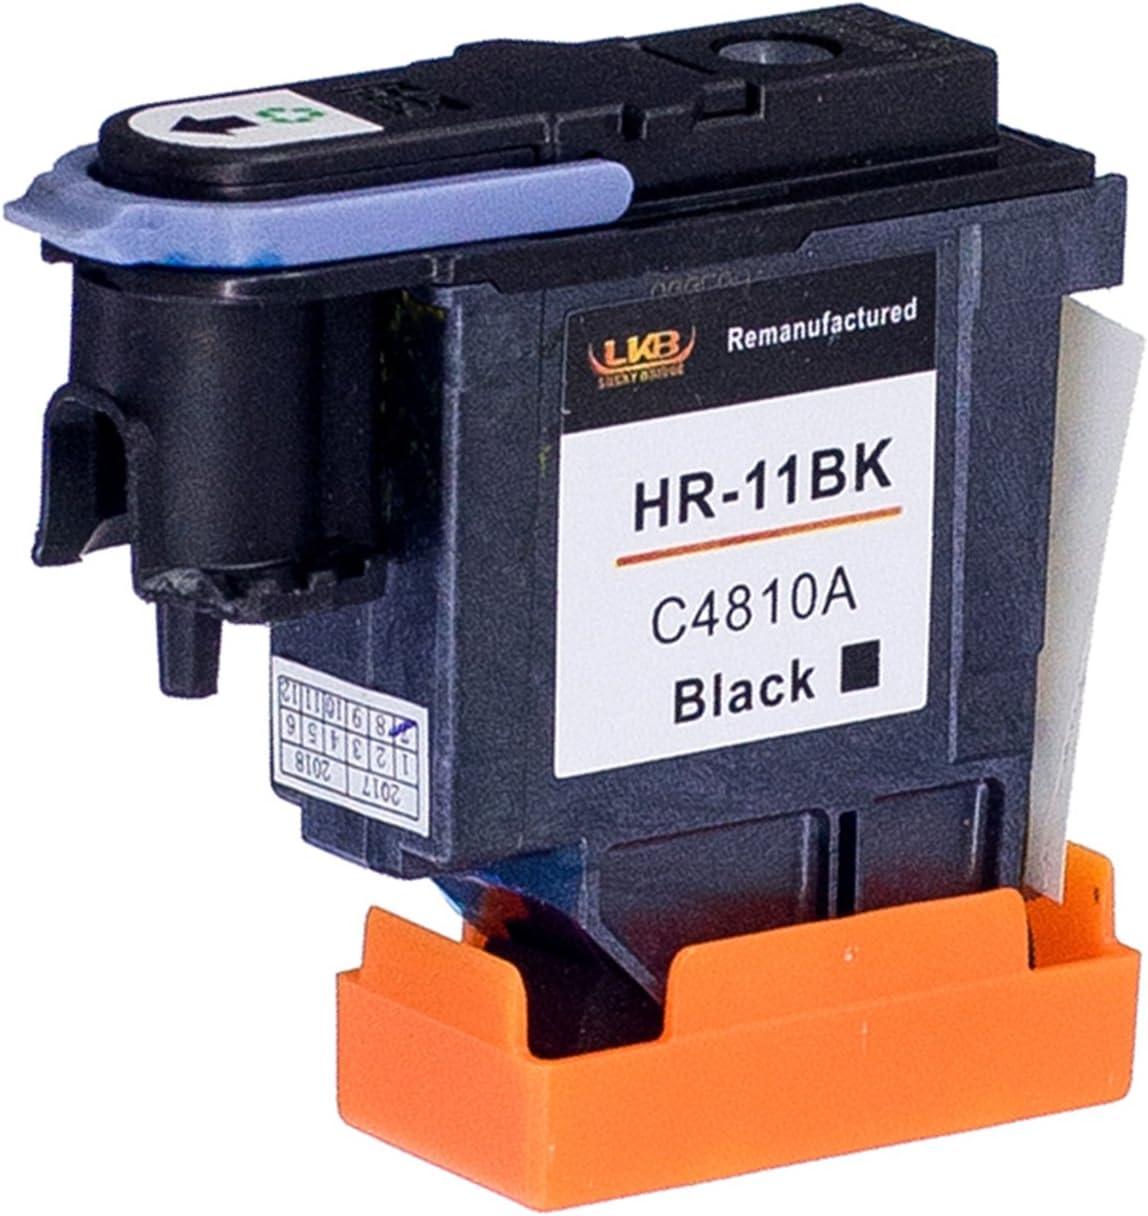 Lucky puente 1PK HP11 C4810 A – Cabezal de impresión compatible para HP Business Inkjet 2200, 2250, 2280, 2600, 2800 HP Designjet 110 NR, Designjet 10PS, 20PS, 50PS, 500 800 Impresoras (1 BK): Amazon.es: Oficina y papelería